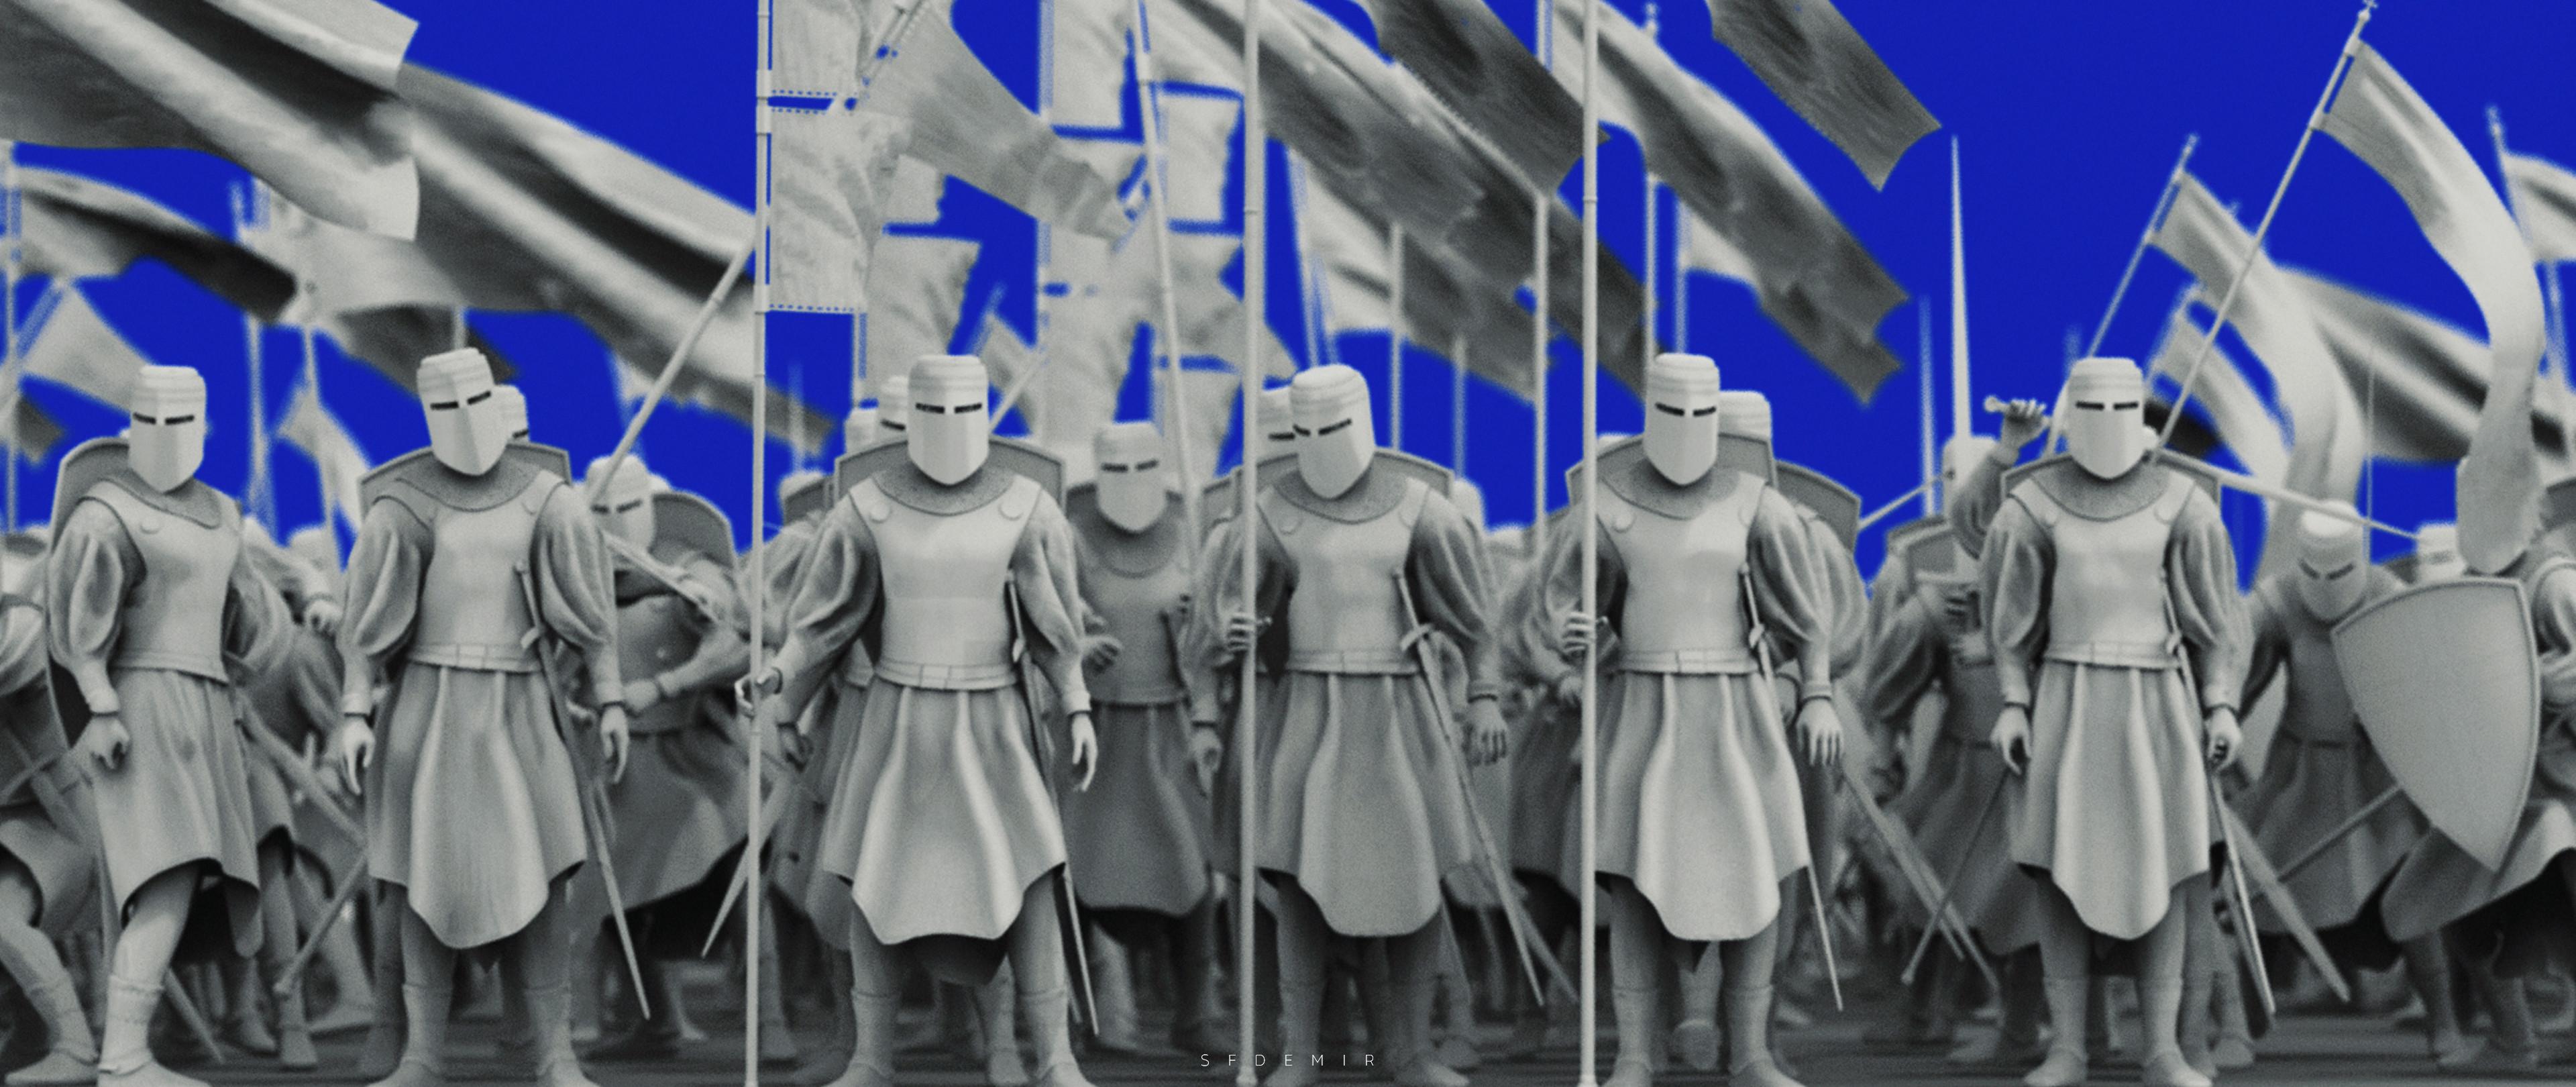 Preparing For War Scene - Shot 03 - Clay Render